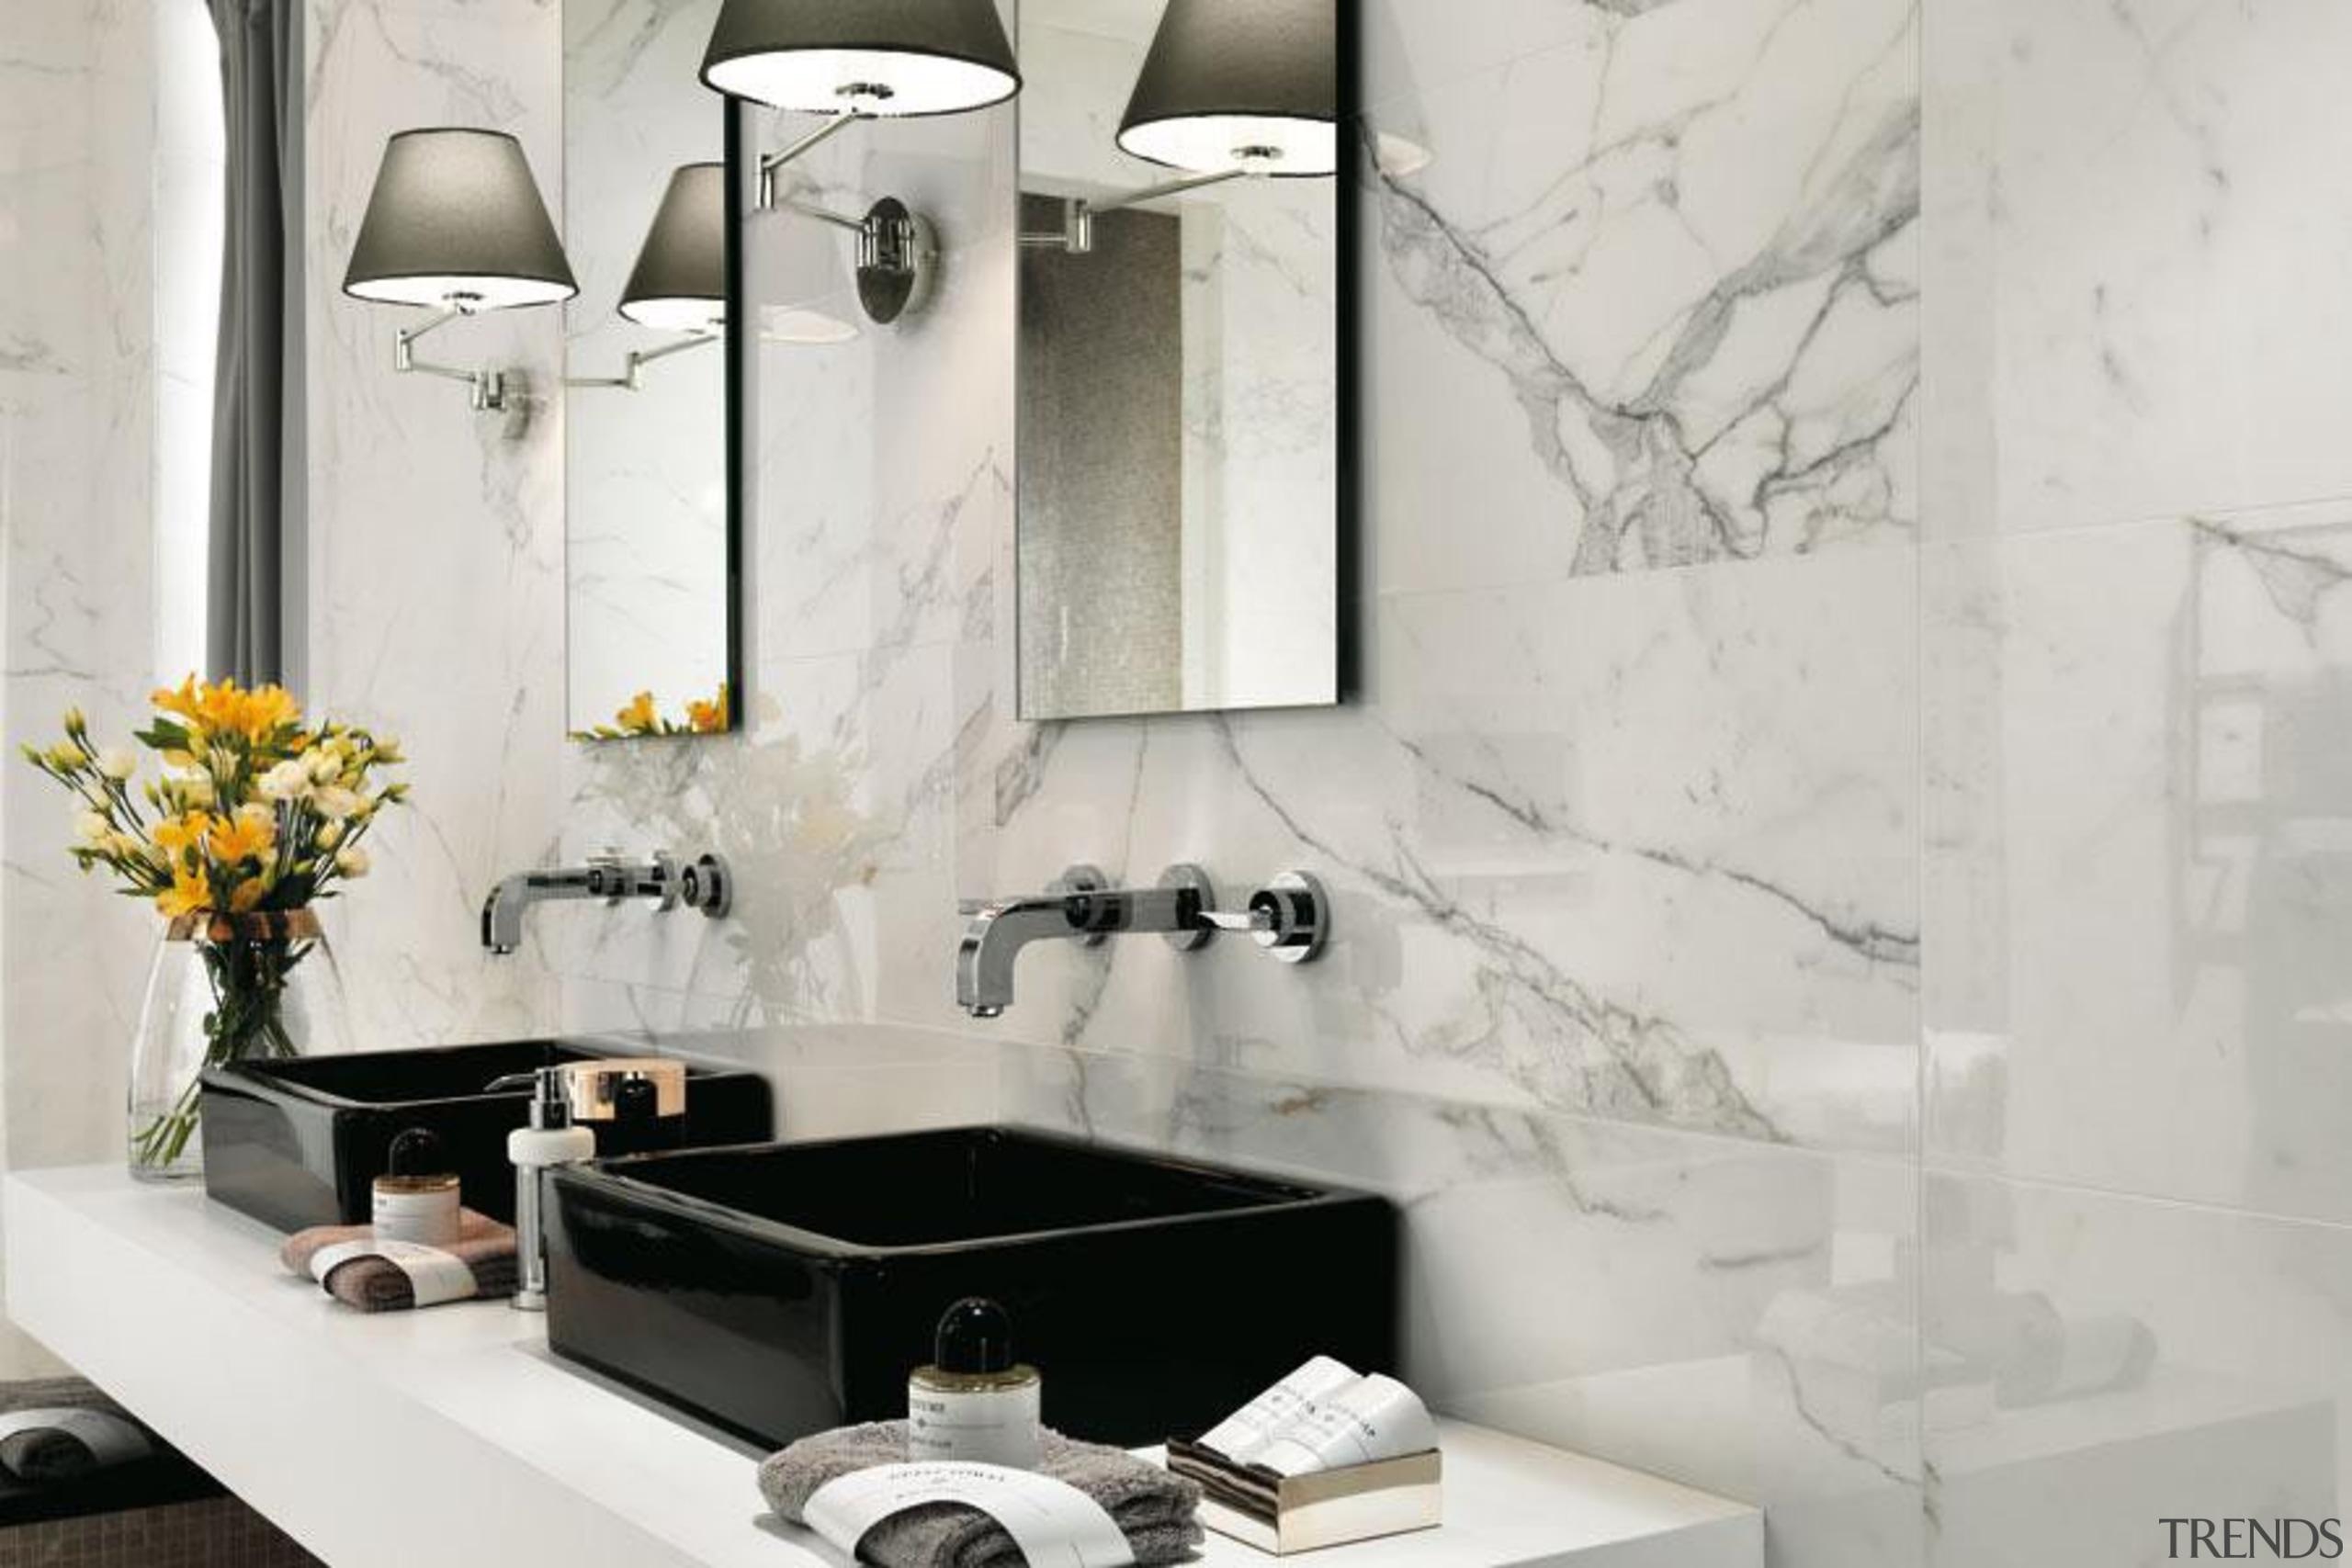 Marvel calacatta bathroom wall tiles - Cb 531375050107944 bathroom, ceramic, floor, flooring, interior design, plumbing fixture, product design, room, sink, tap, tile, wall, gray